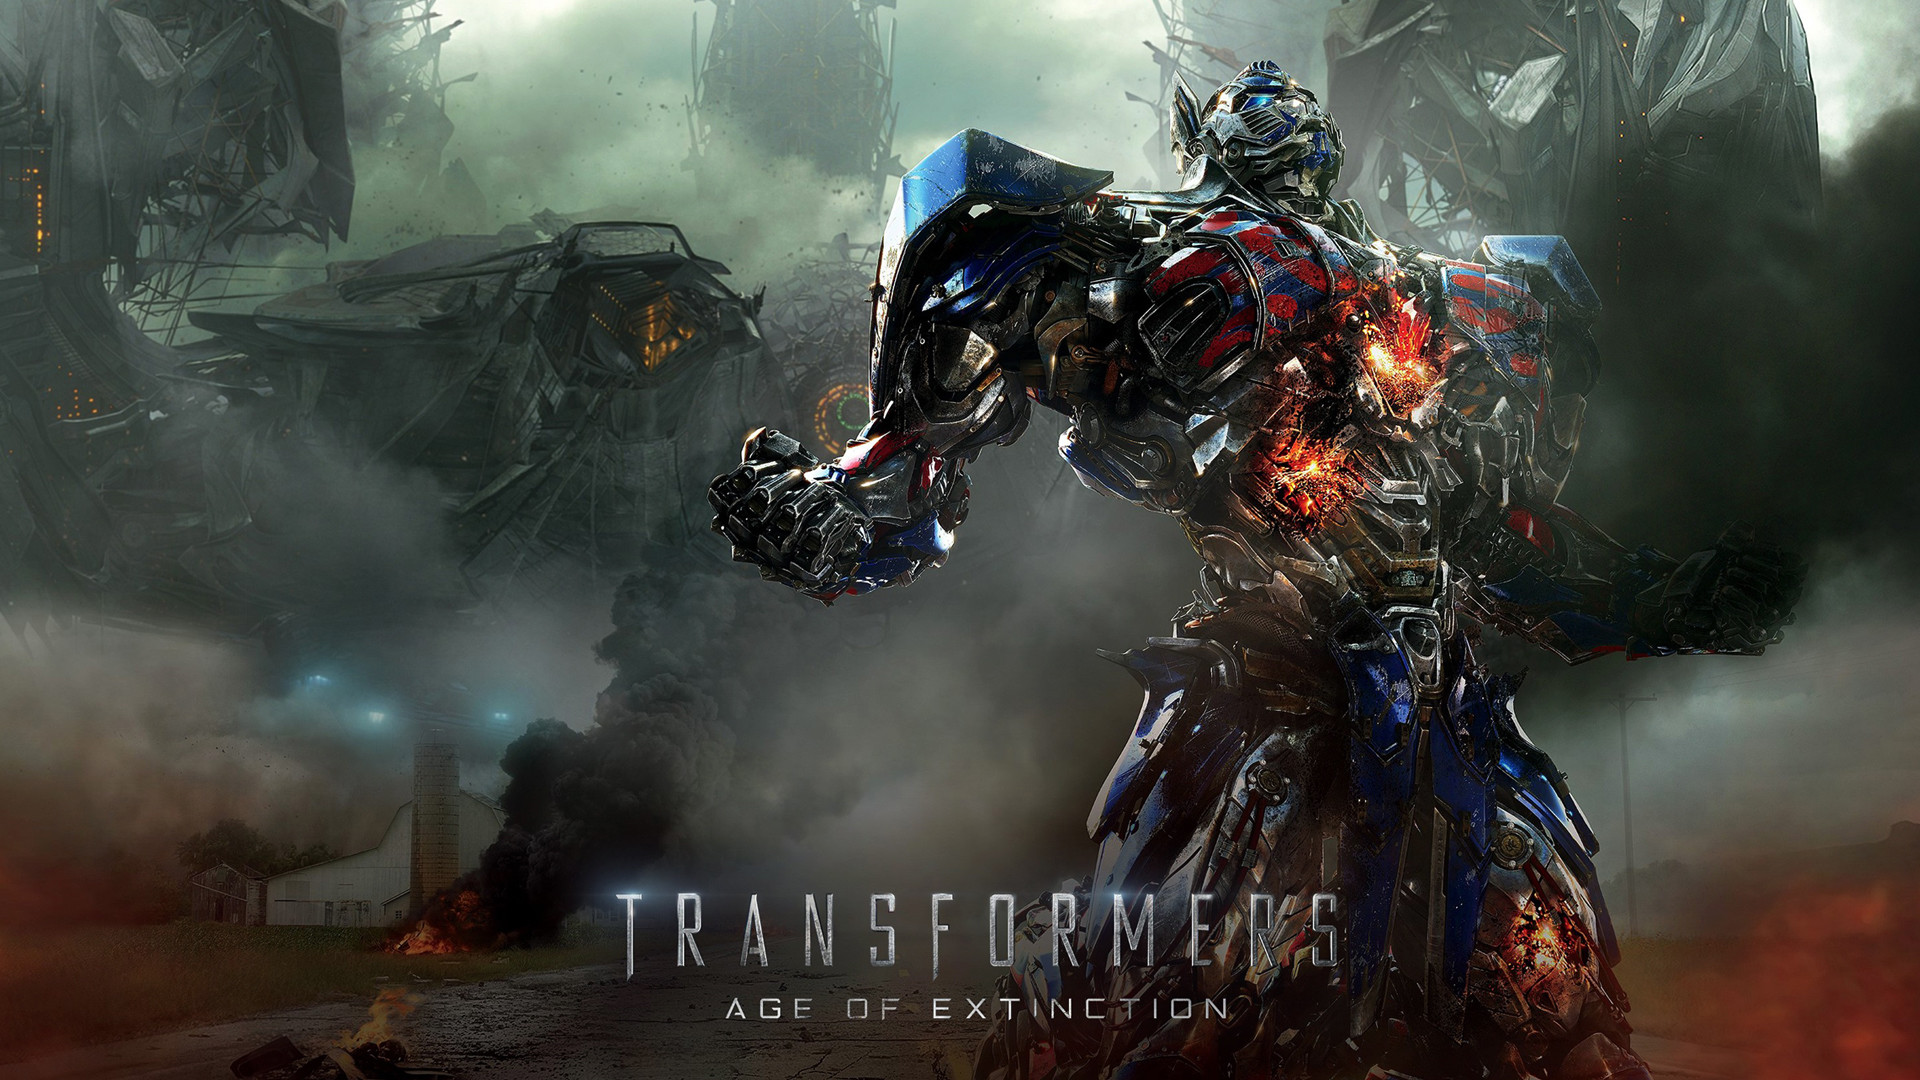 Optimus Prime Transformers Age of Extinction